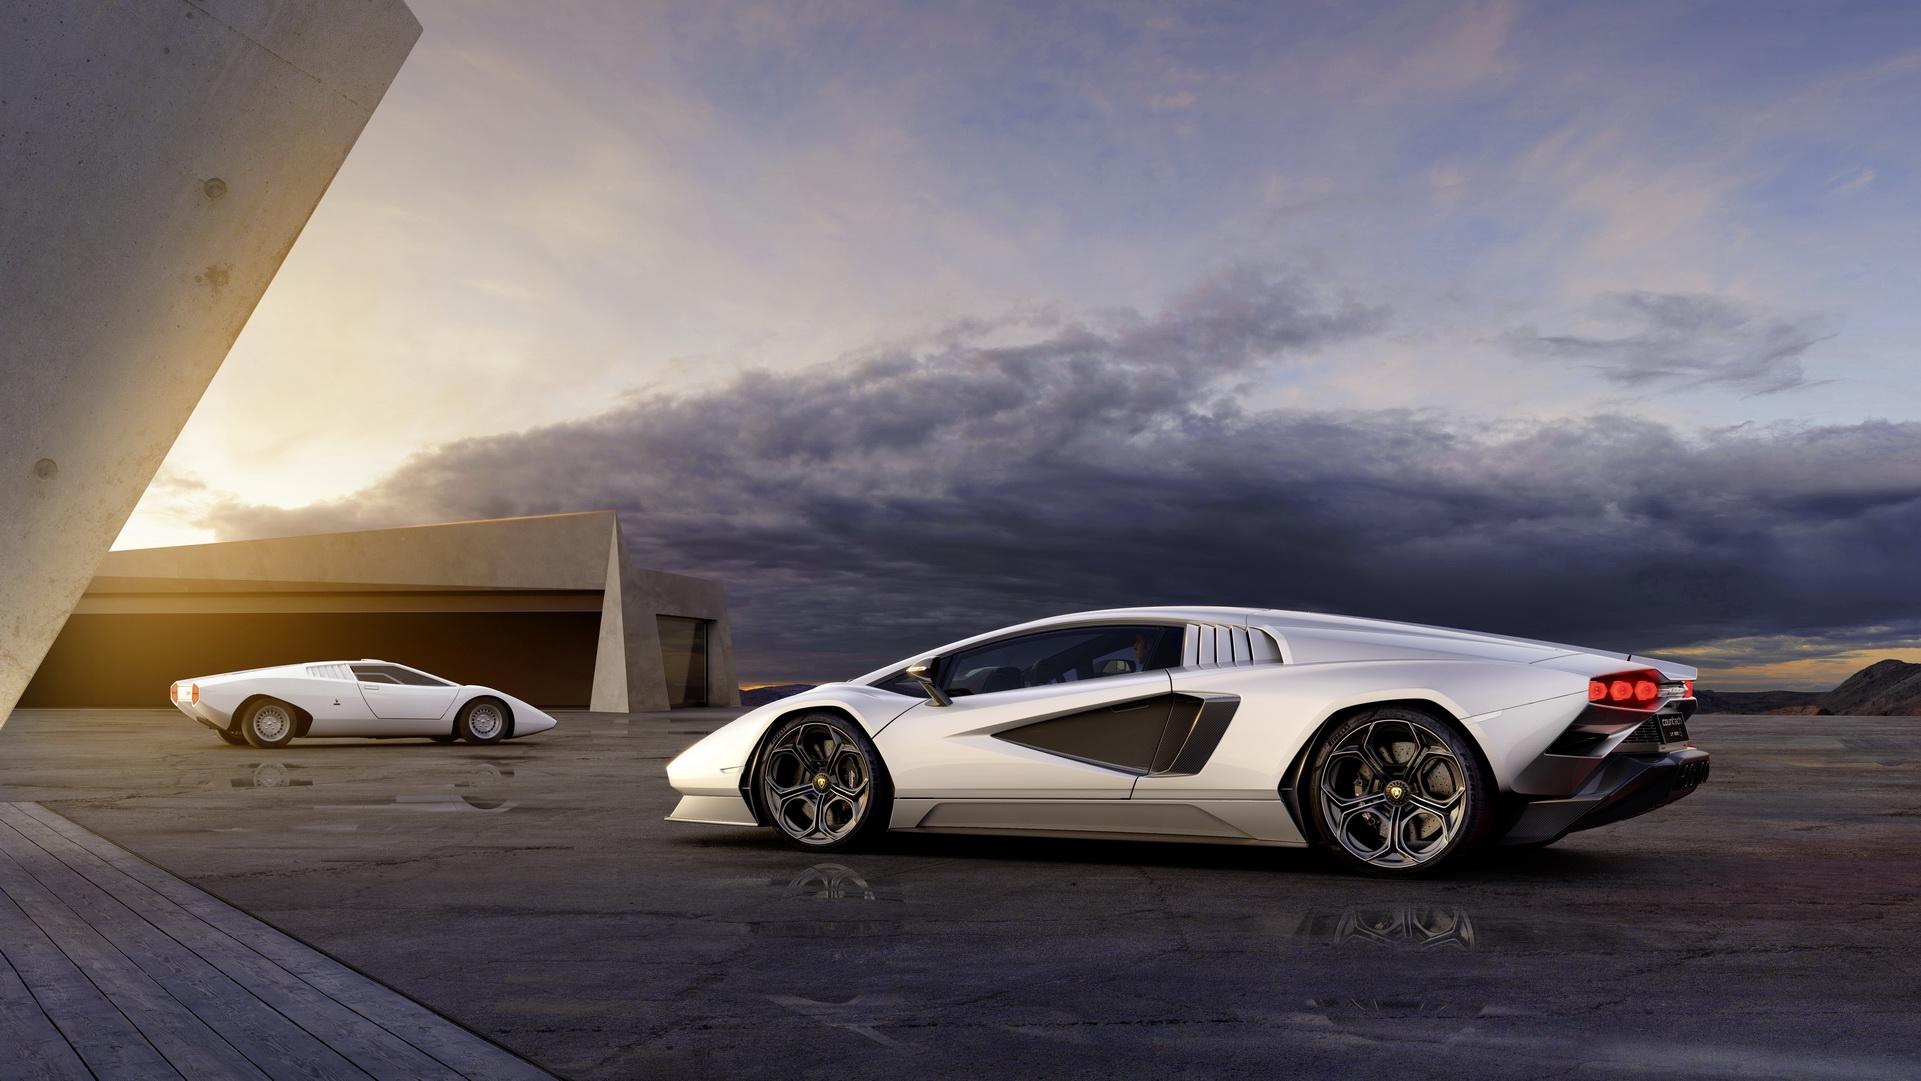 2022 Lamborghini Countach LPI 800-4 Side Wallpapers (7)